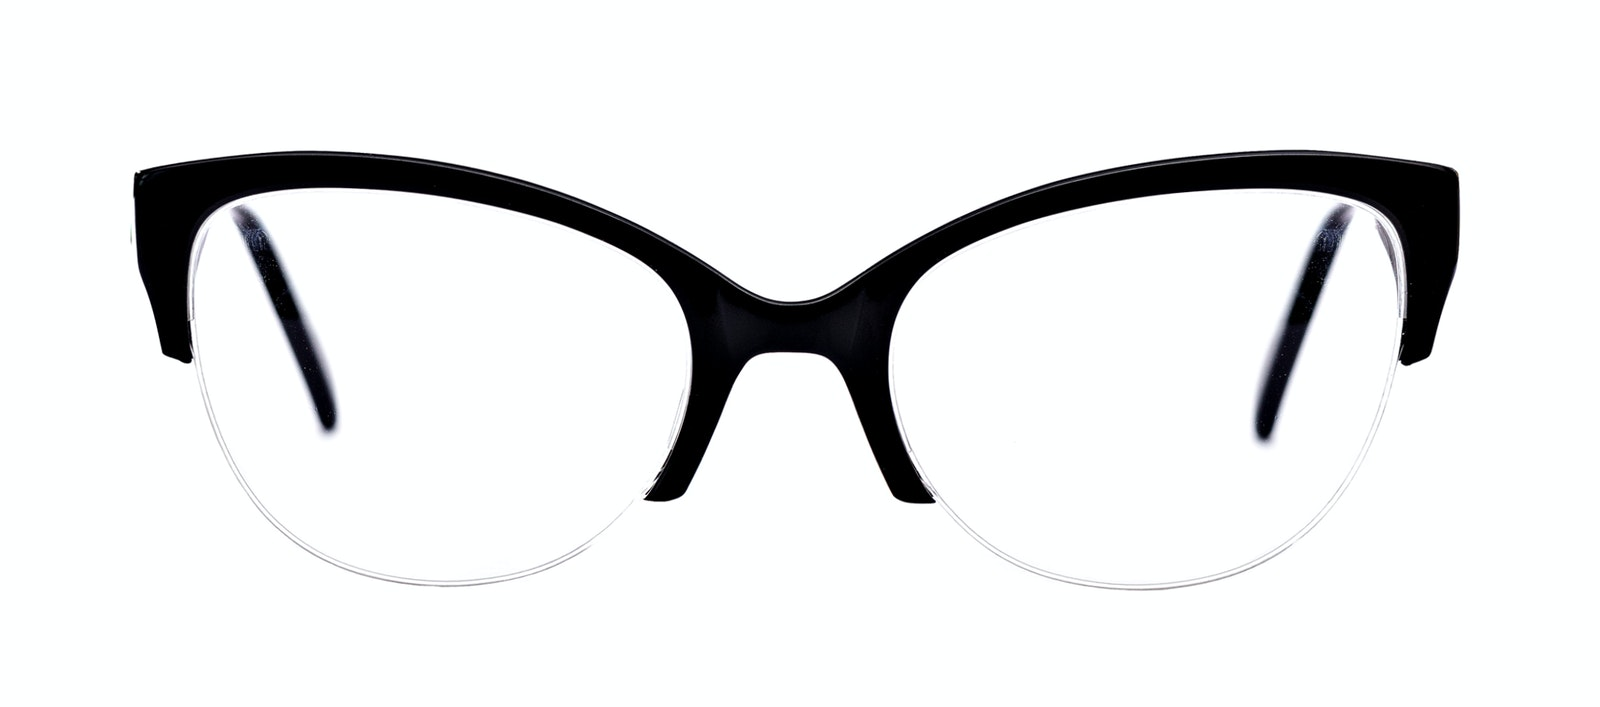 fdac7dc561 ... Affordable Fashion Glasses Cat Eye Eyeglasses Women Lovely Ebony Front  ...